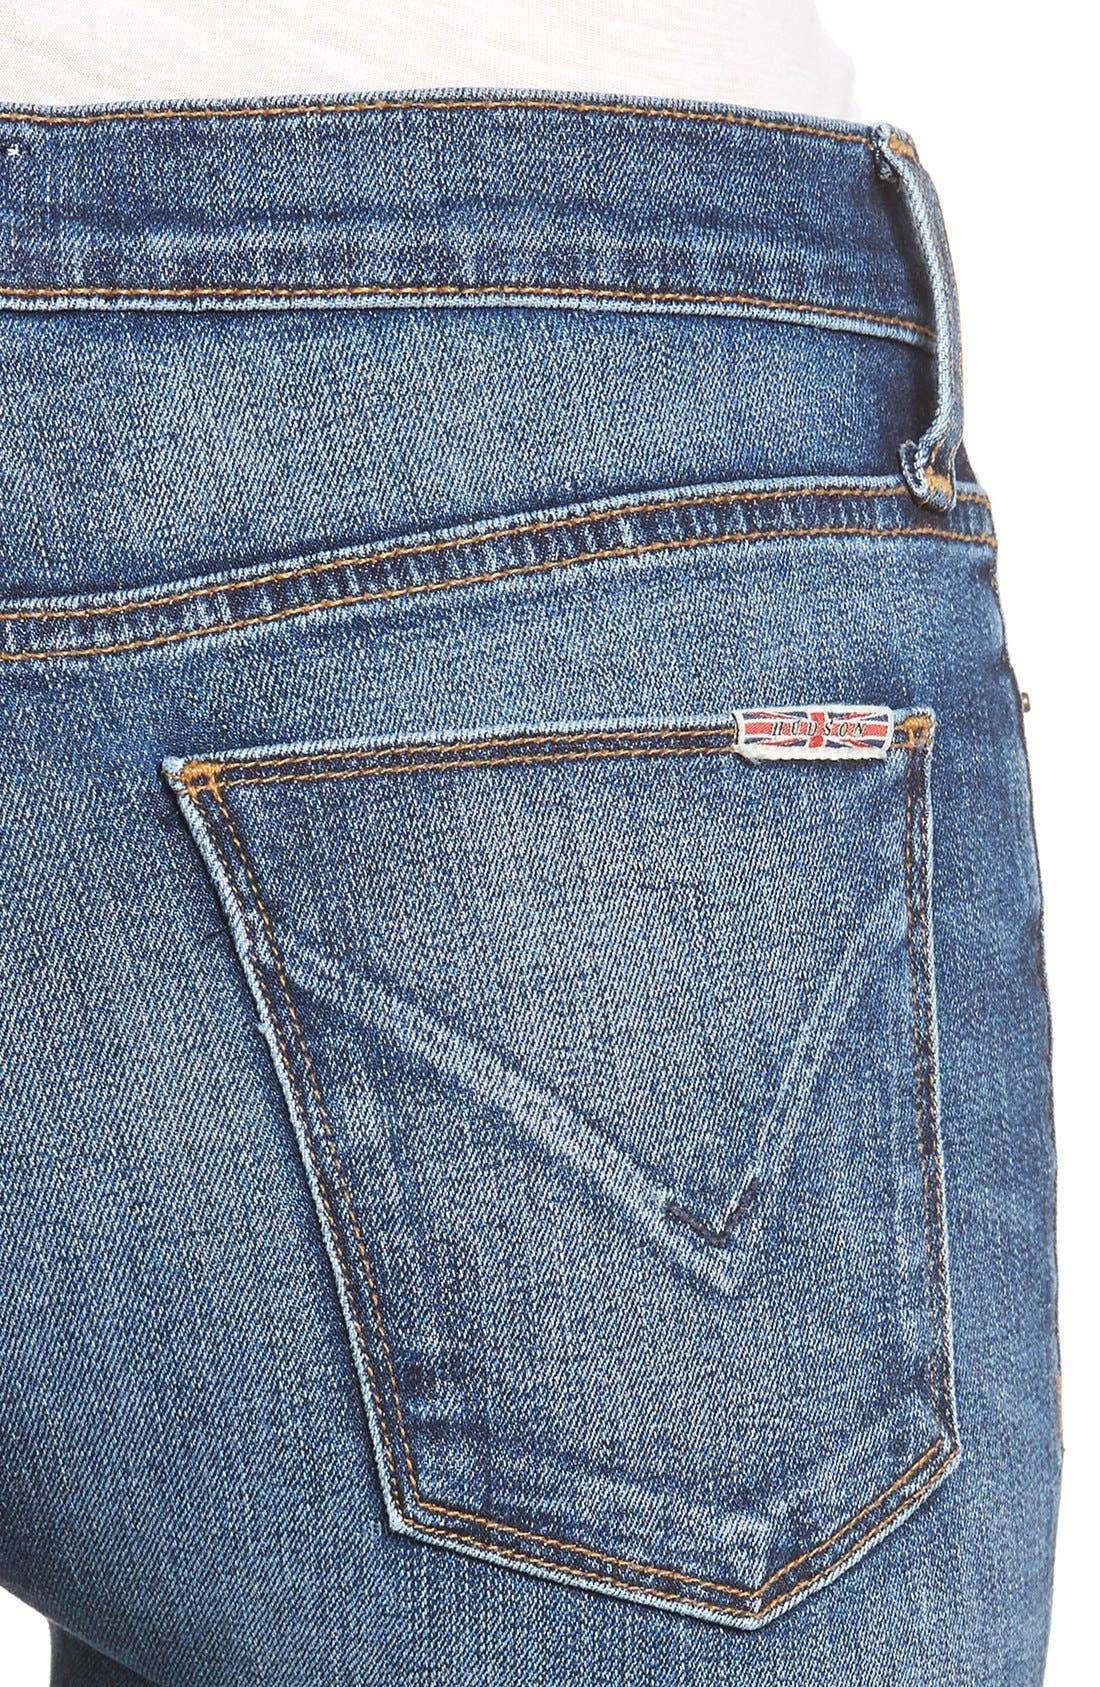 Nico Super Skinny Jeans,                             Alternate thumbnail 4, color,                             Legion